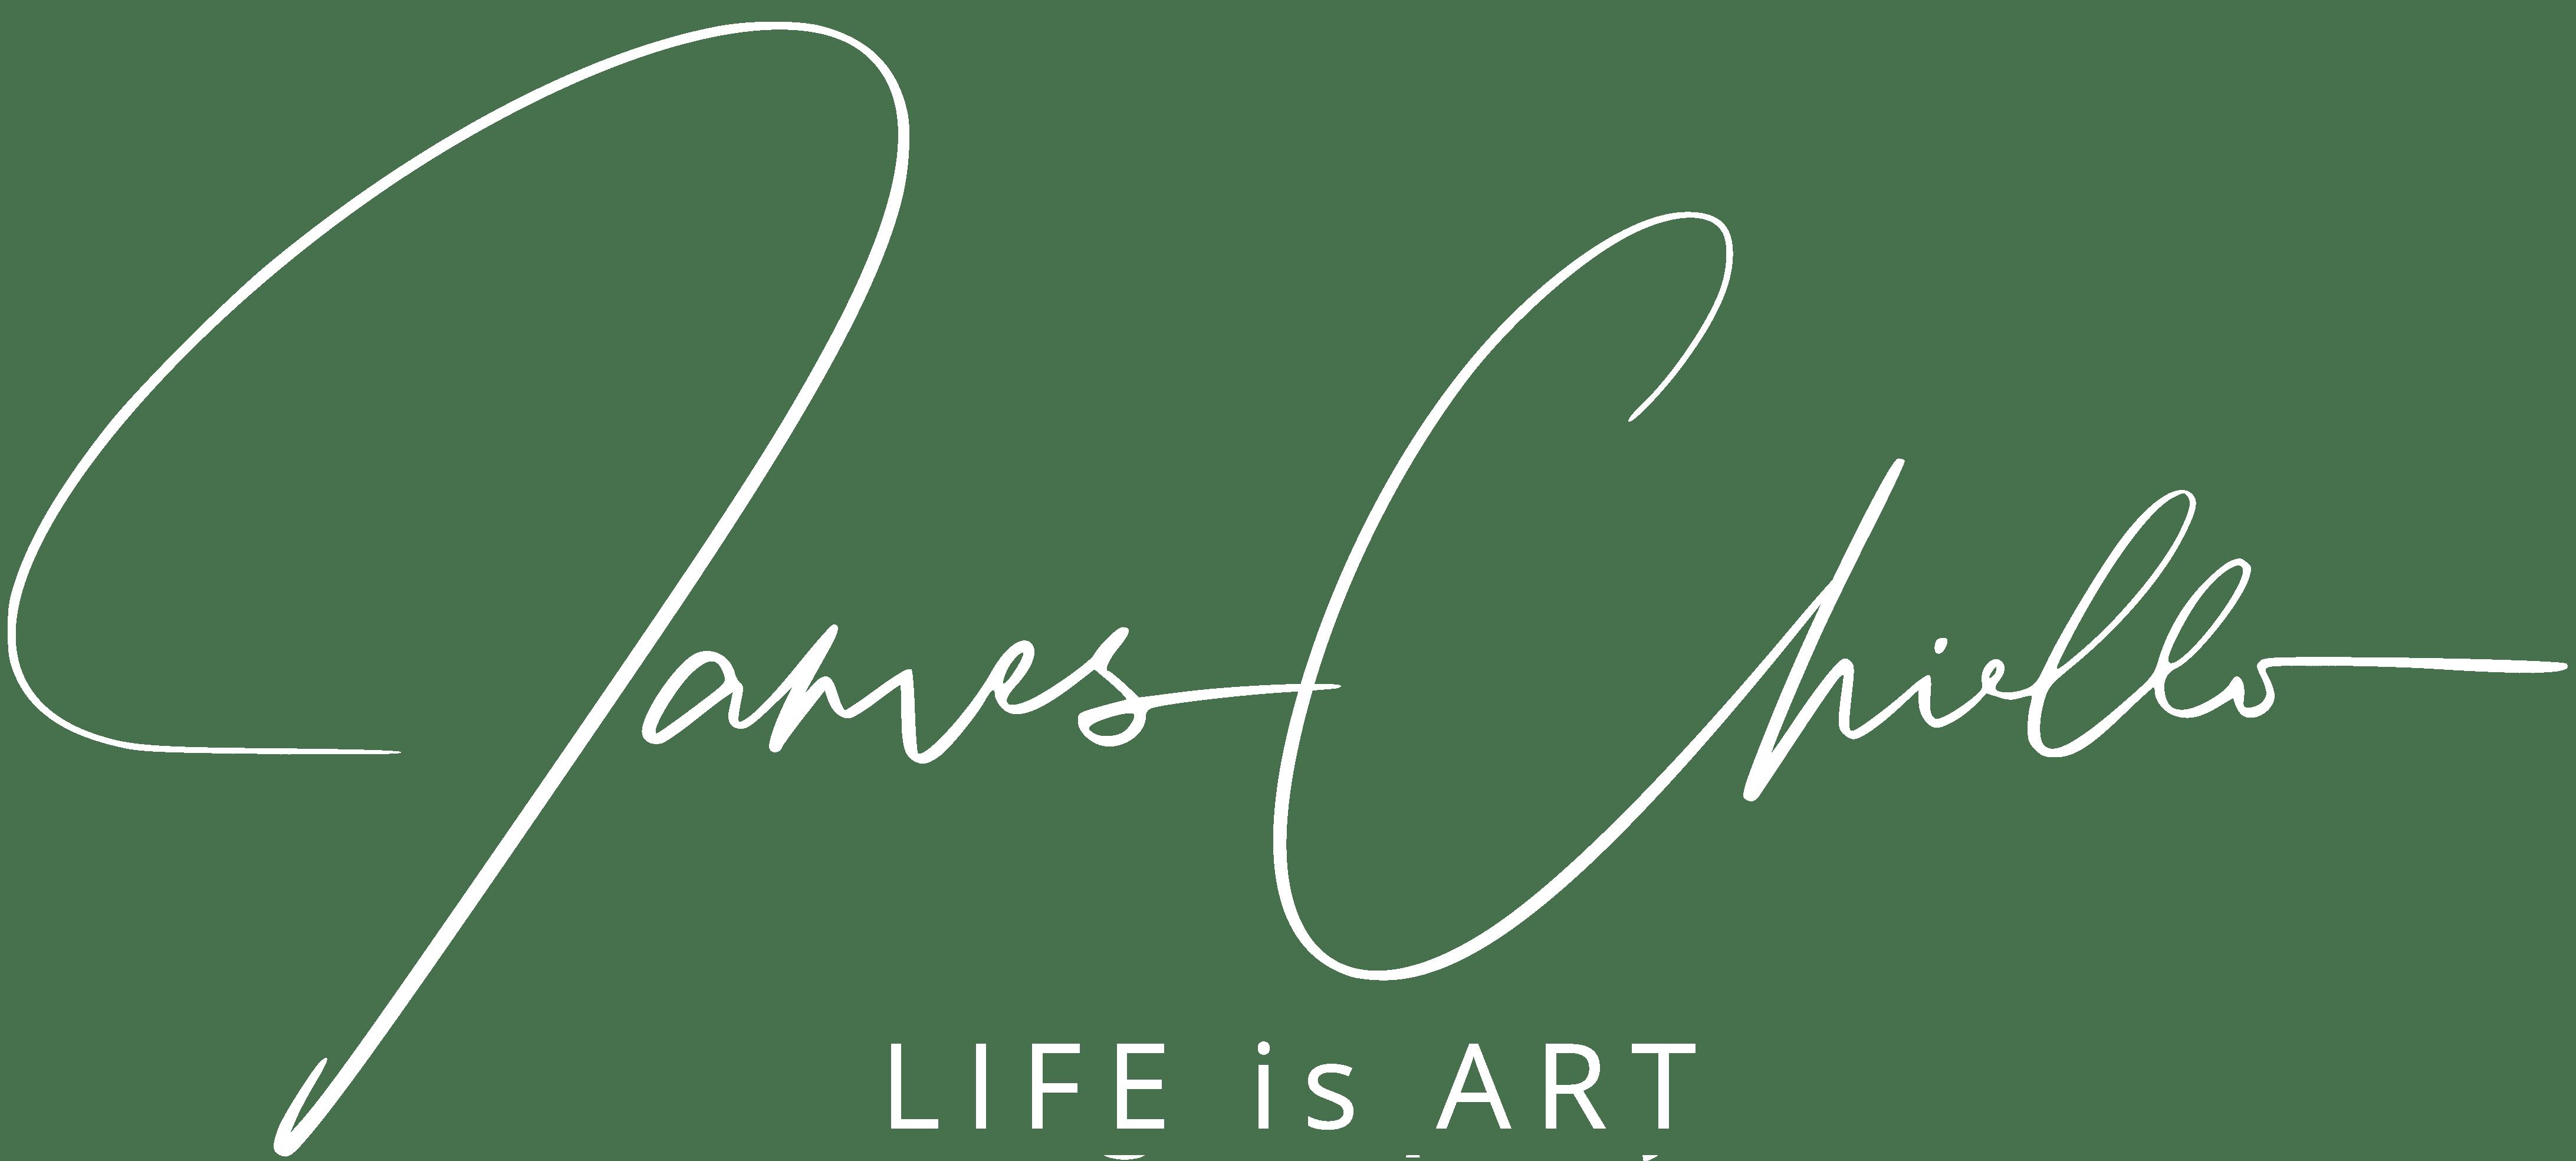 James Christopher Knight company logo